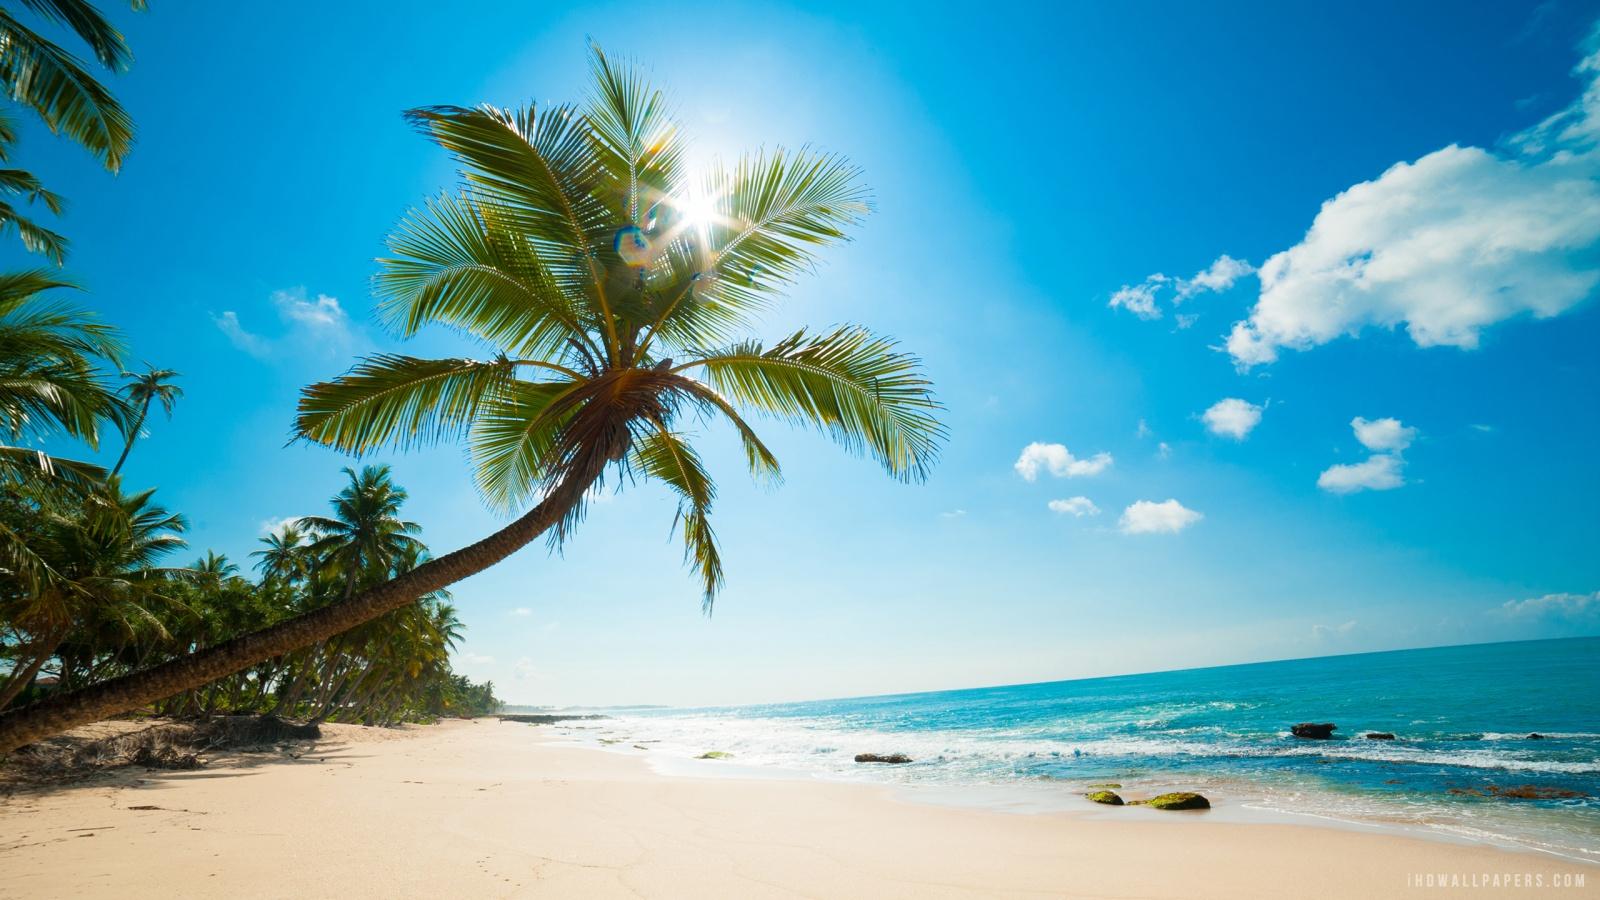 Caribbean Beach HD Wallpaper   iHD Wallpapers 1600x900